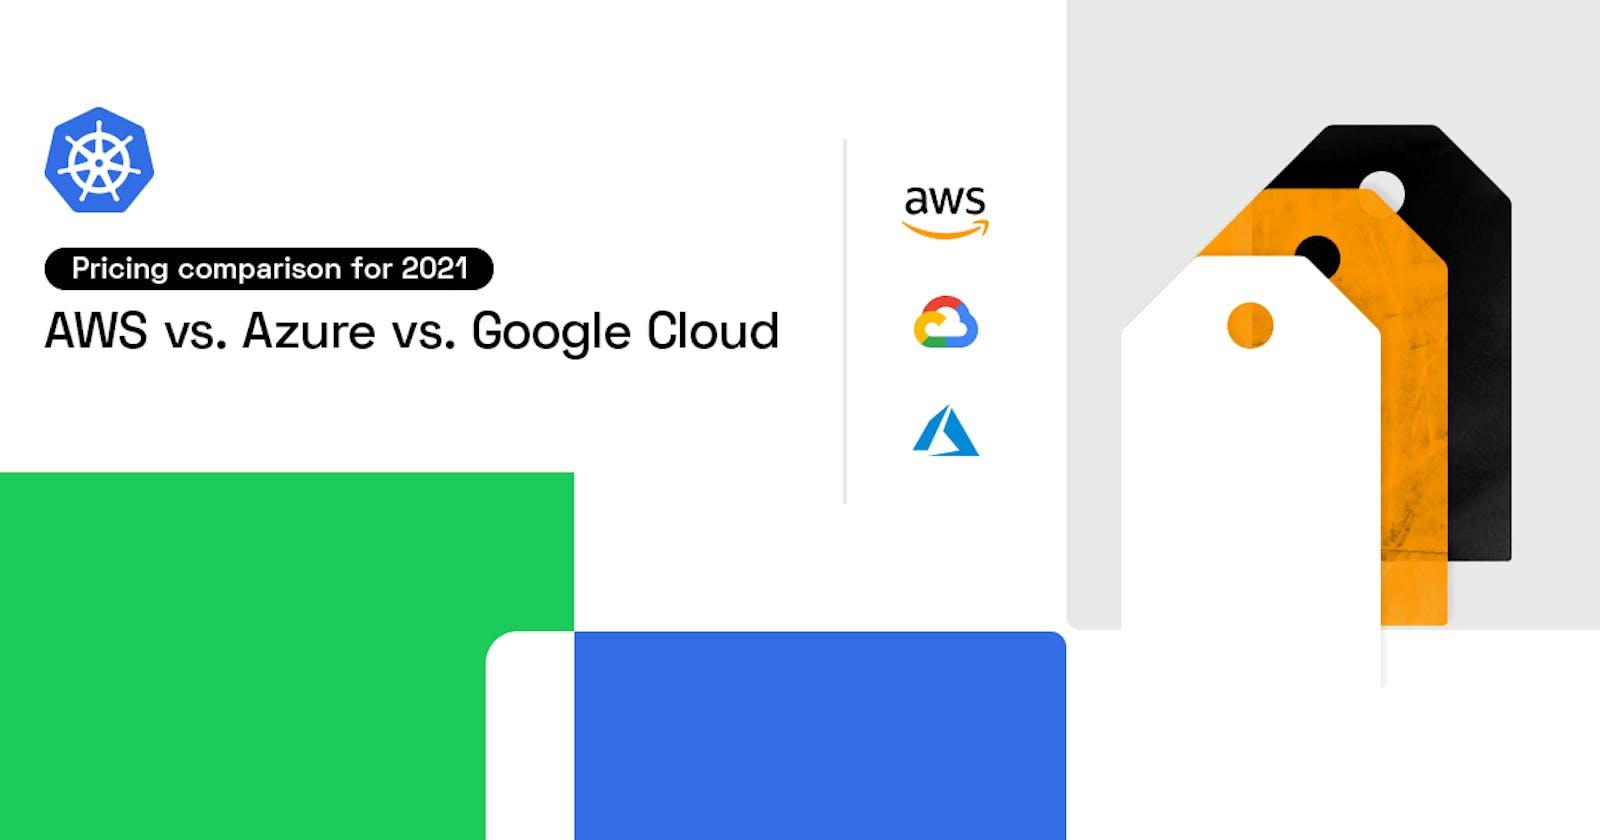 Ultimate cloud pricing comparison: AWS vs. Azure vs. Google Cloud in 2021